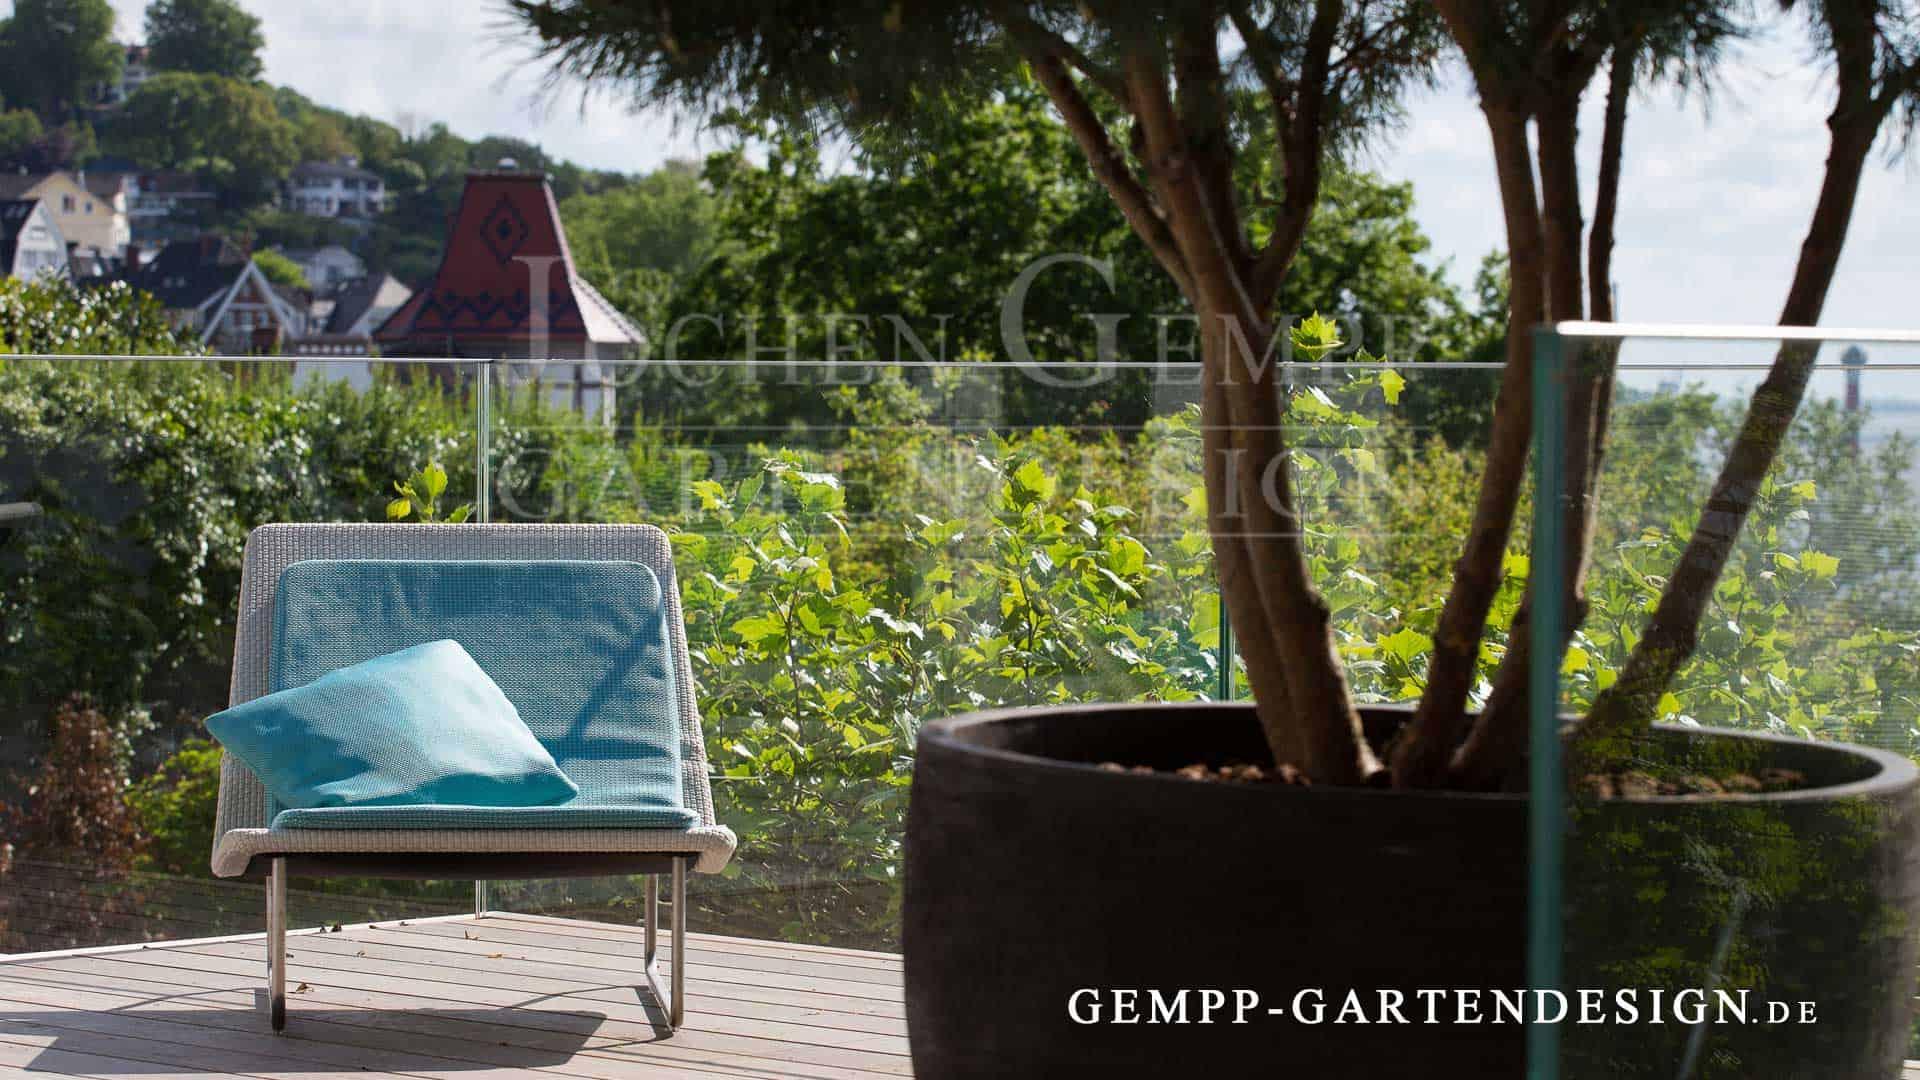 TERRASSENGESTALTUNG | Gempp Gartendesign